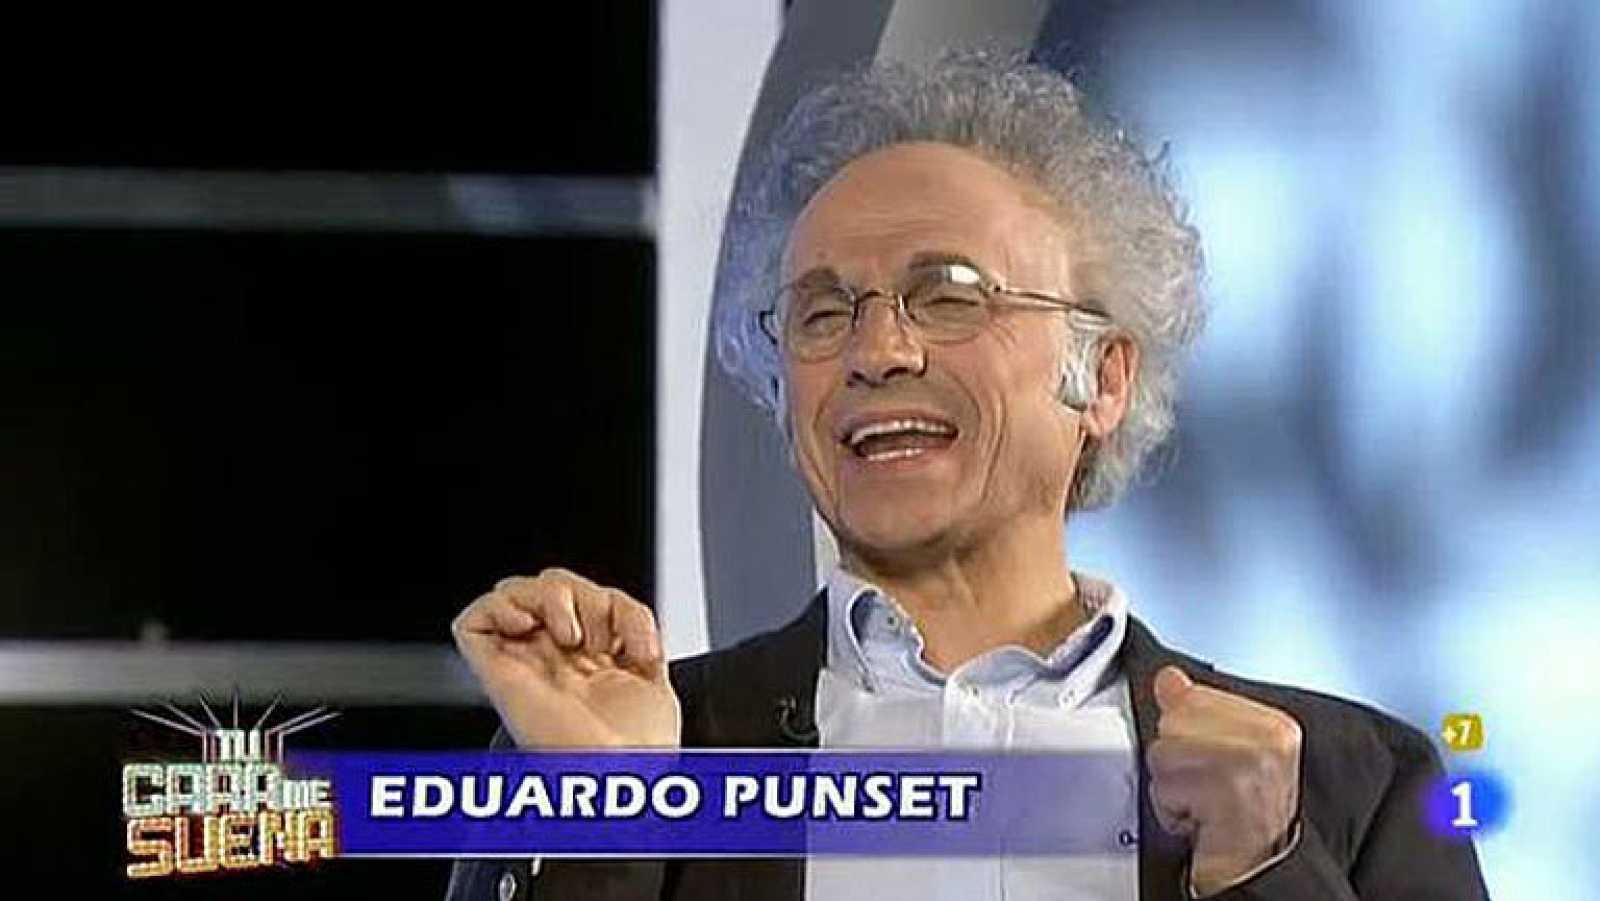 La hora de José Mota - Punset es Manolo Escobar - RTVE.es